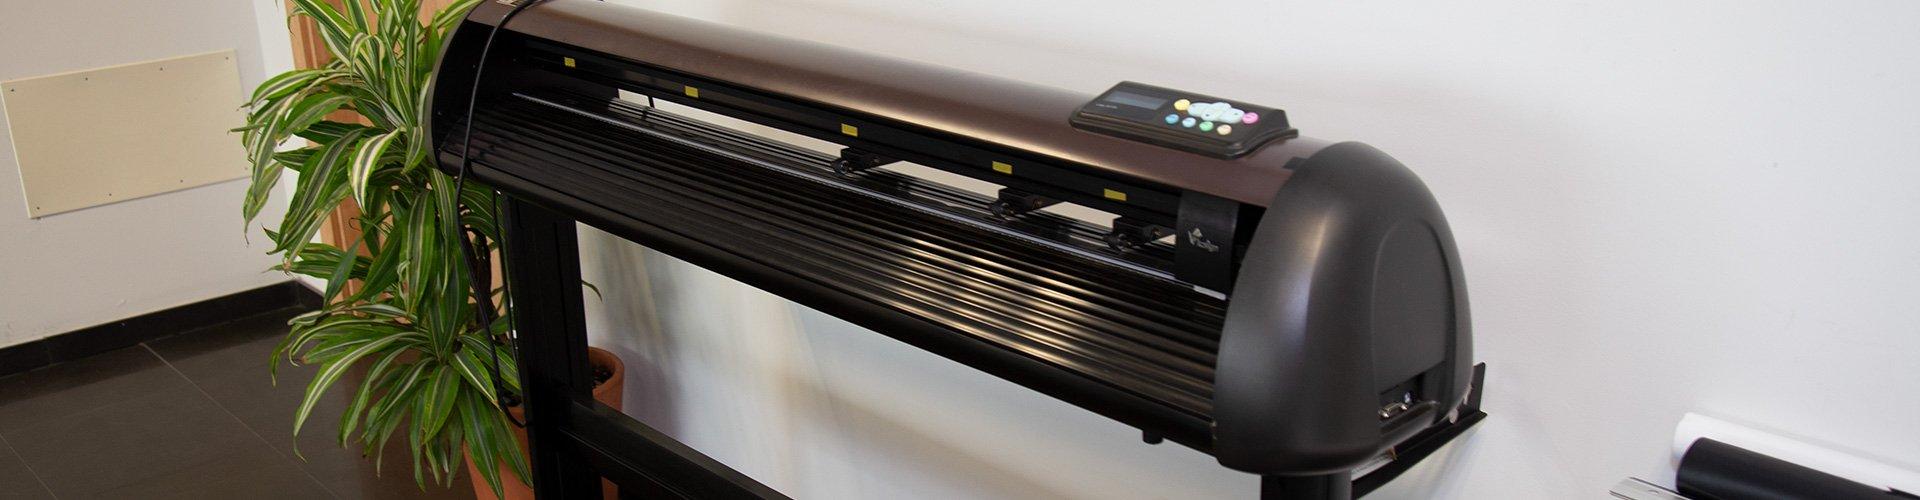 material-impreso-algeciras